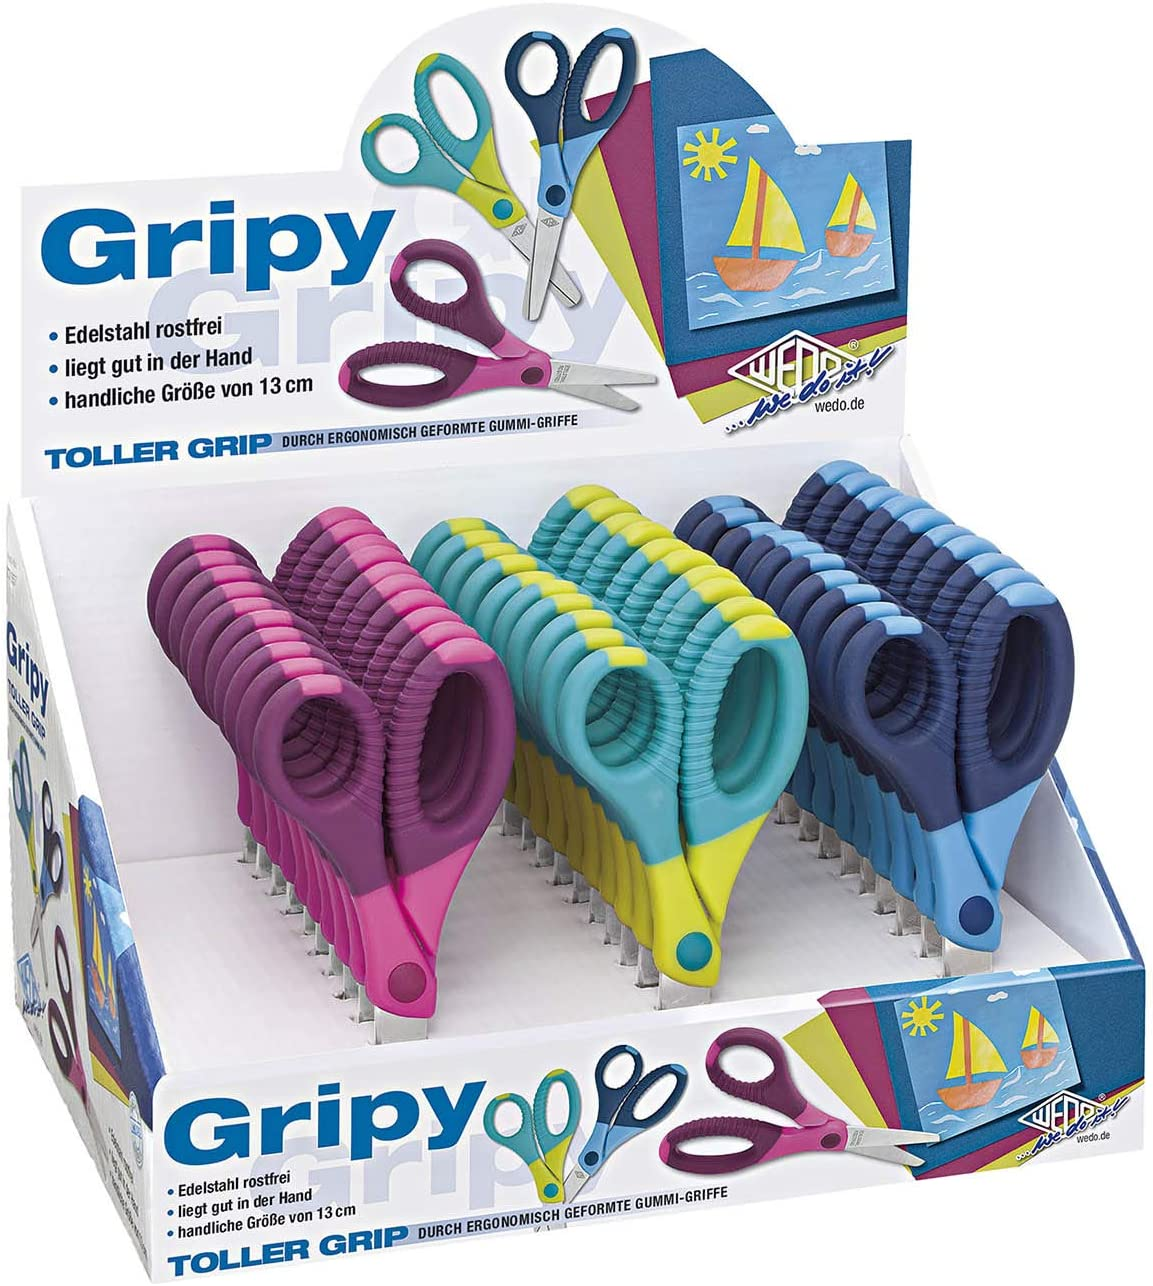 Wedo Gripy Tijeras para manualidades Gripy 13/cm, puntas redondeadas, acero inoxidable Mangos de Goma Ergon/ómica, color azul